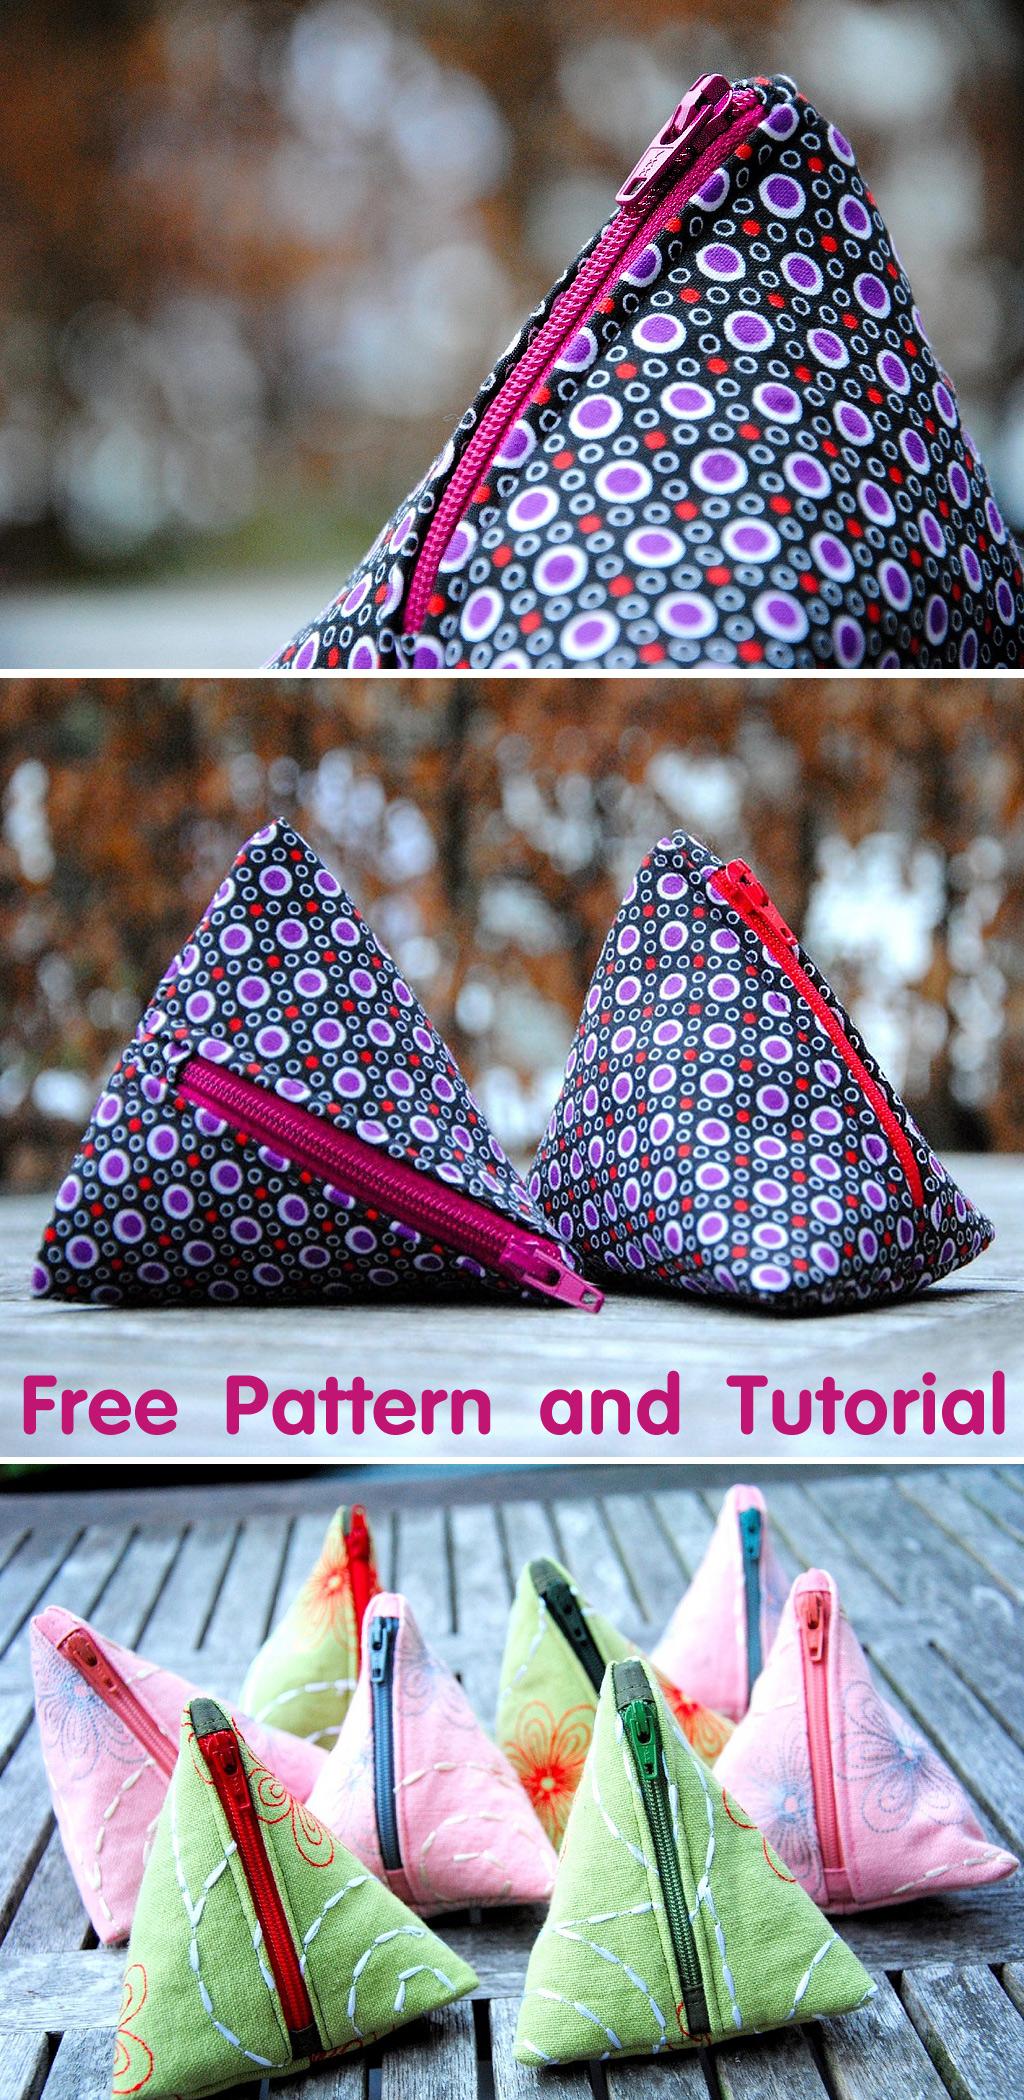 Pyramid Bag Tutorial and Pattern